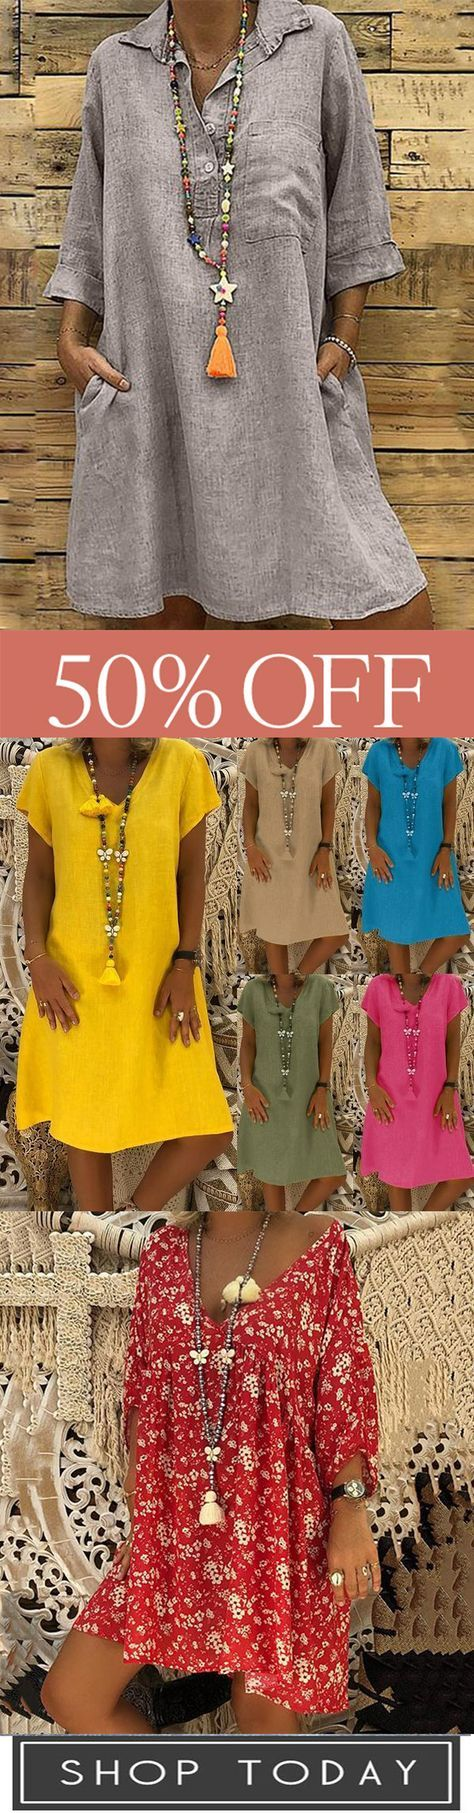 More style >>>Hot-sale Women's Boho Casual Dresses ...